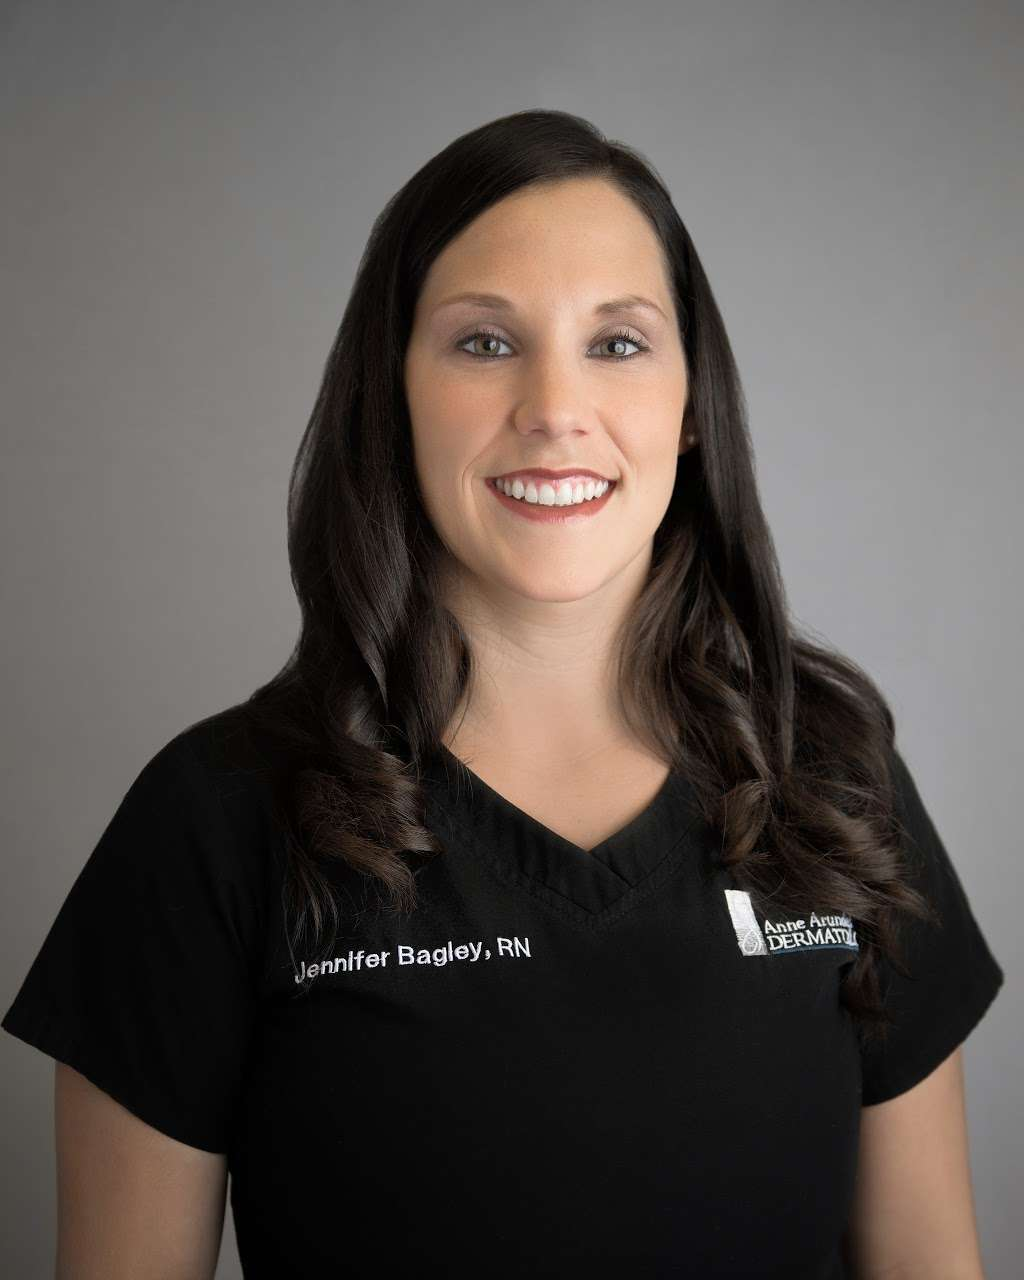 Anne Arundel Dermatology - Doctor   995 N Prince Frederick